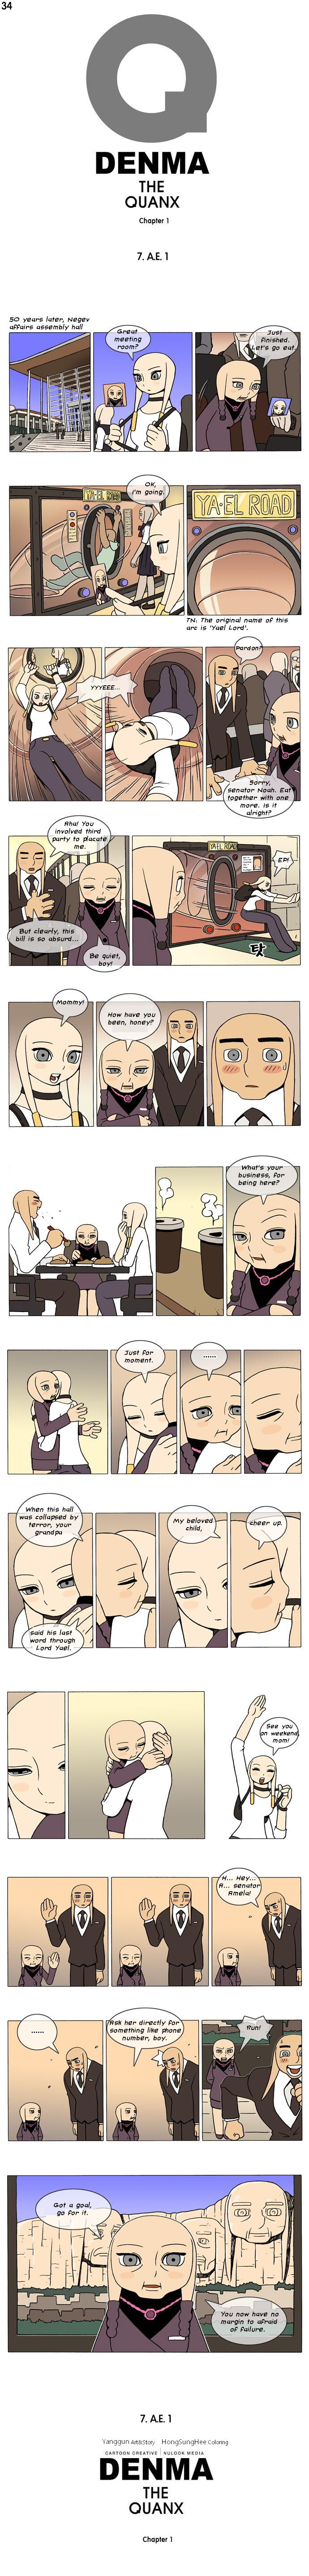 Denma 34 Page 1